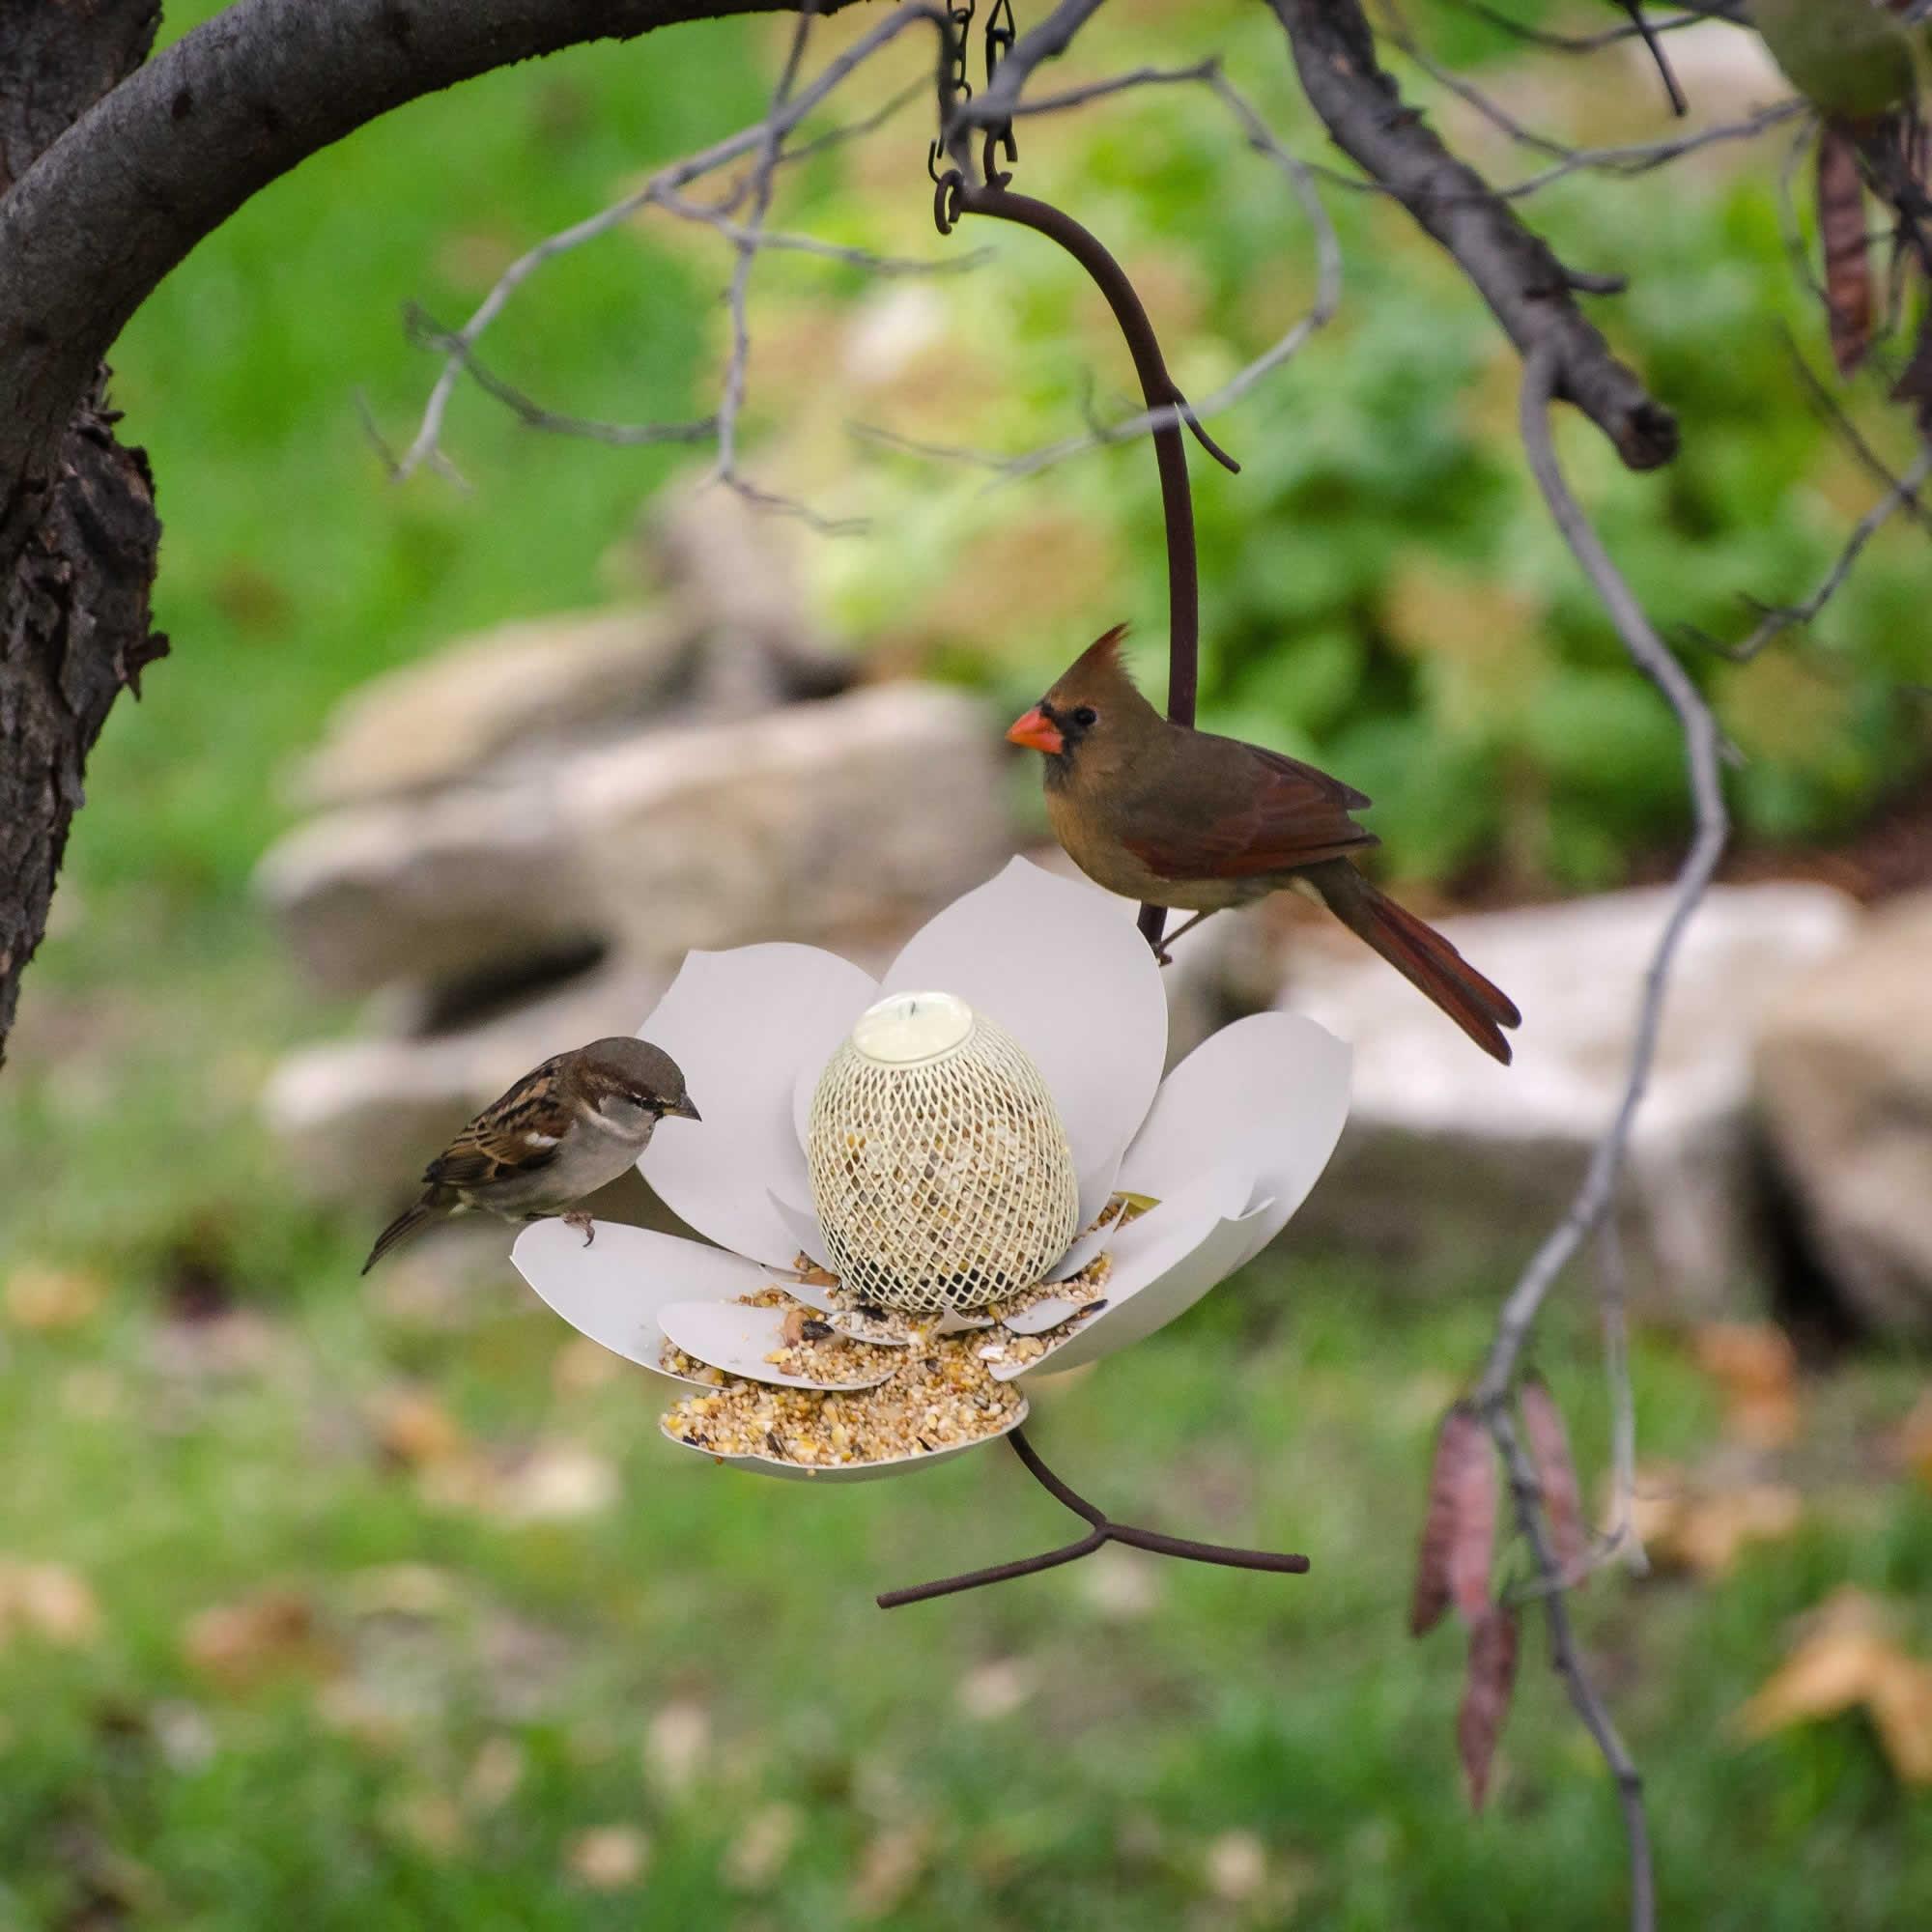 pics gamingdaddyoftwo wild perky bird x pet feeder com evenseed proof squirrel beautiful silo